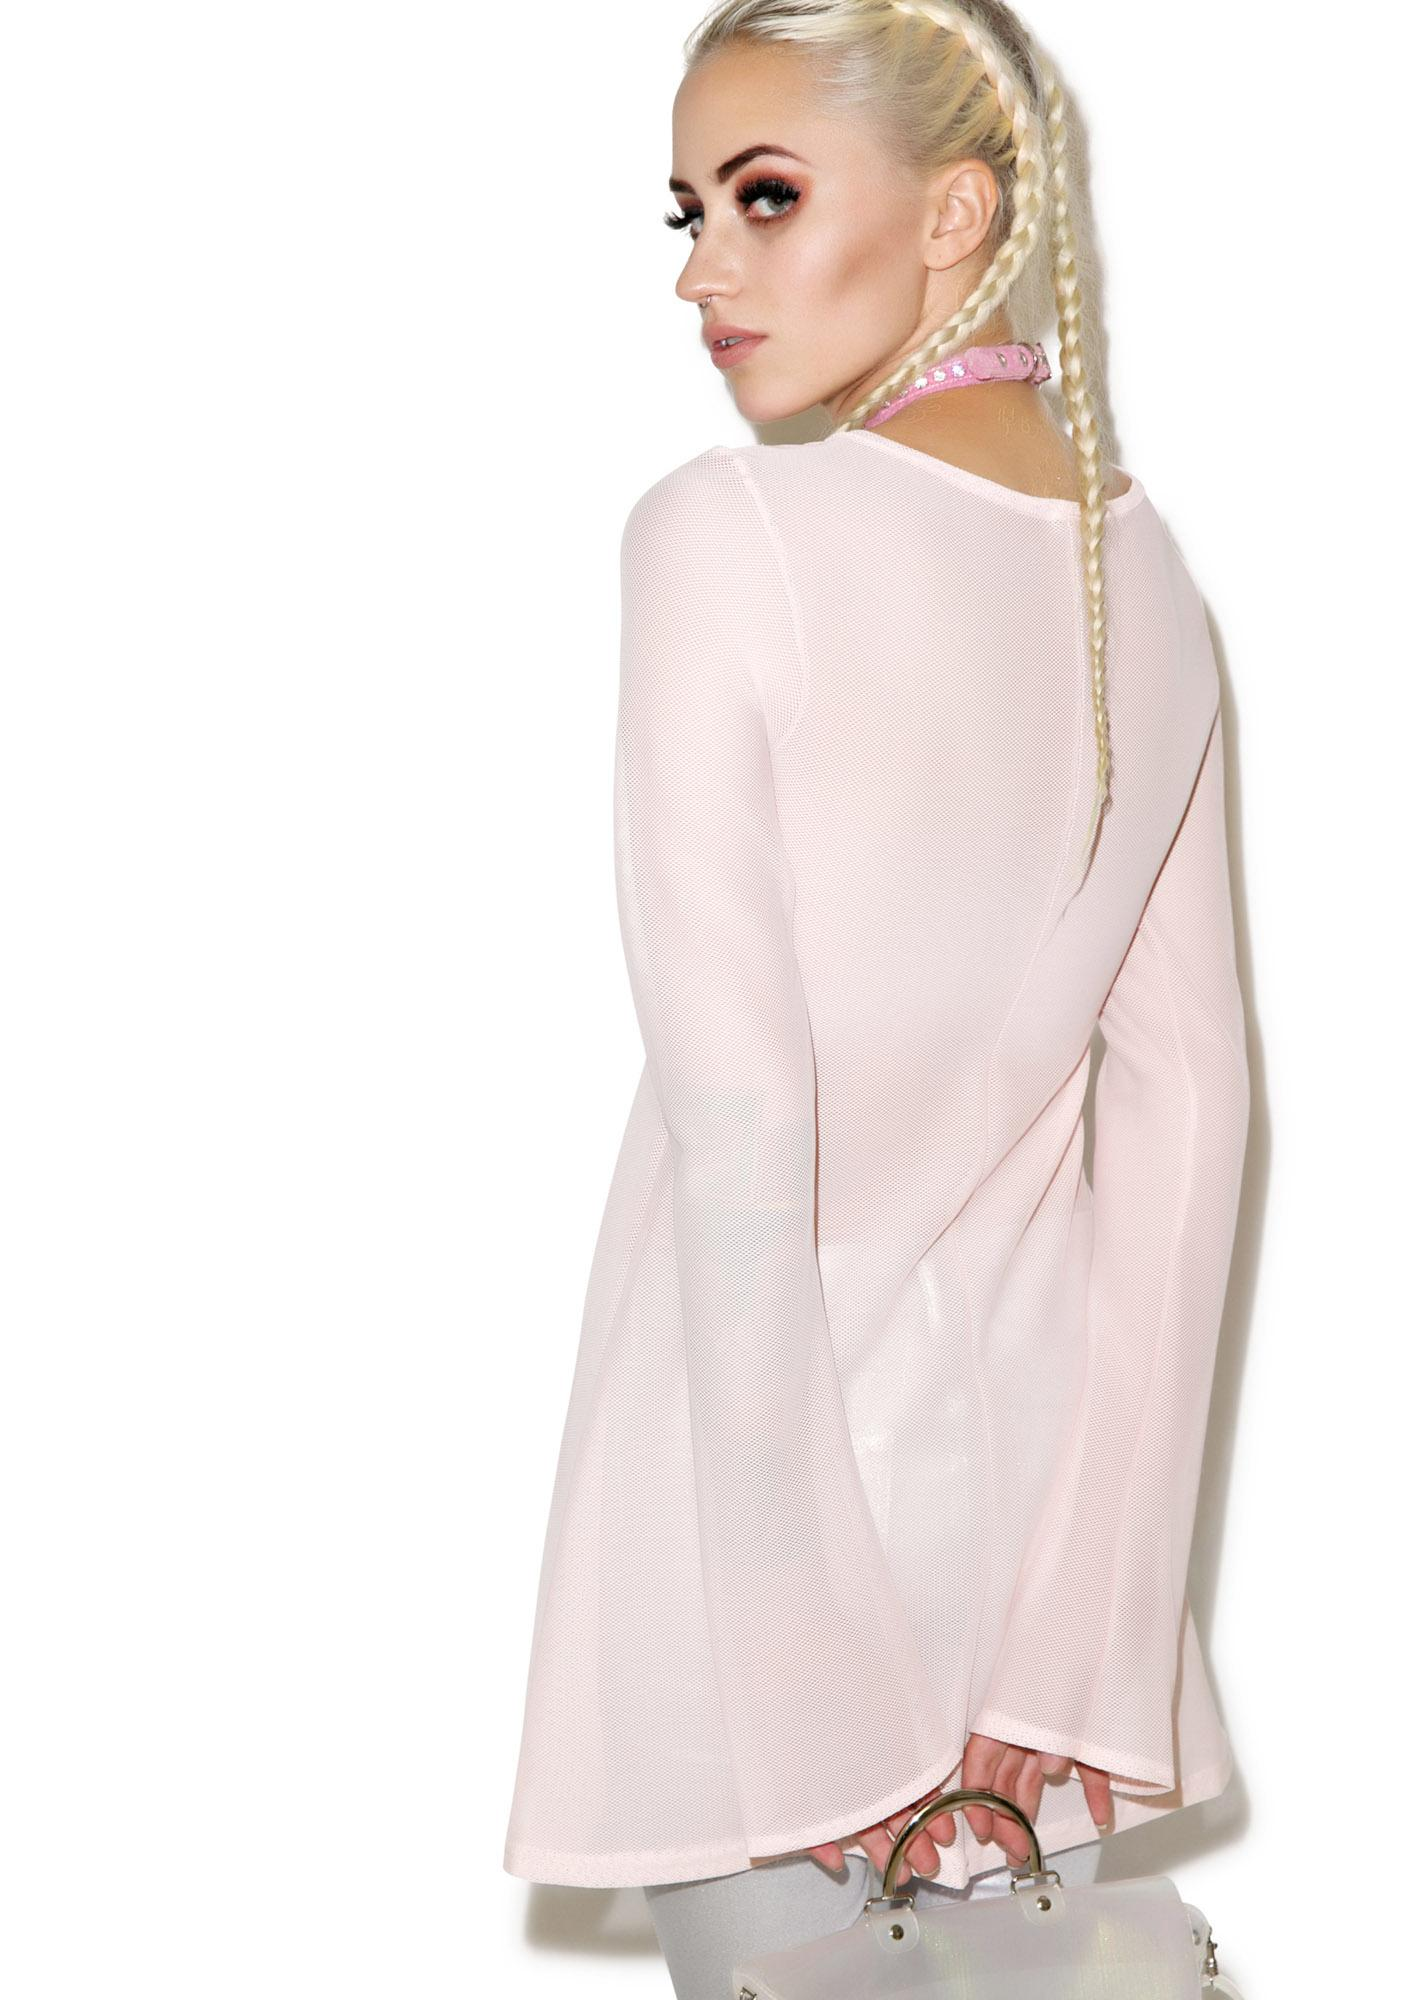 Mesh Getaway Dress Top